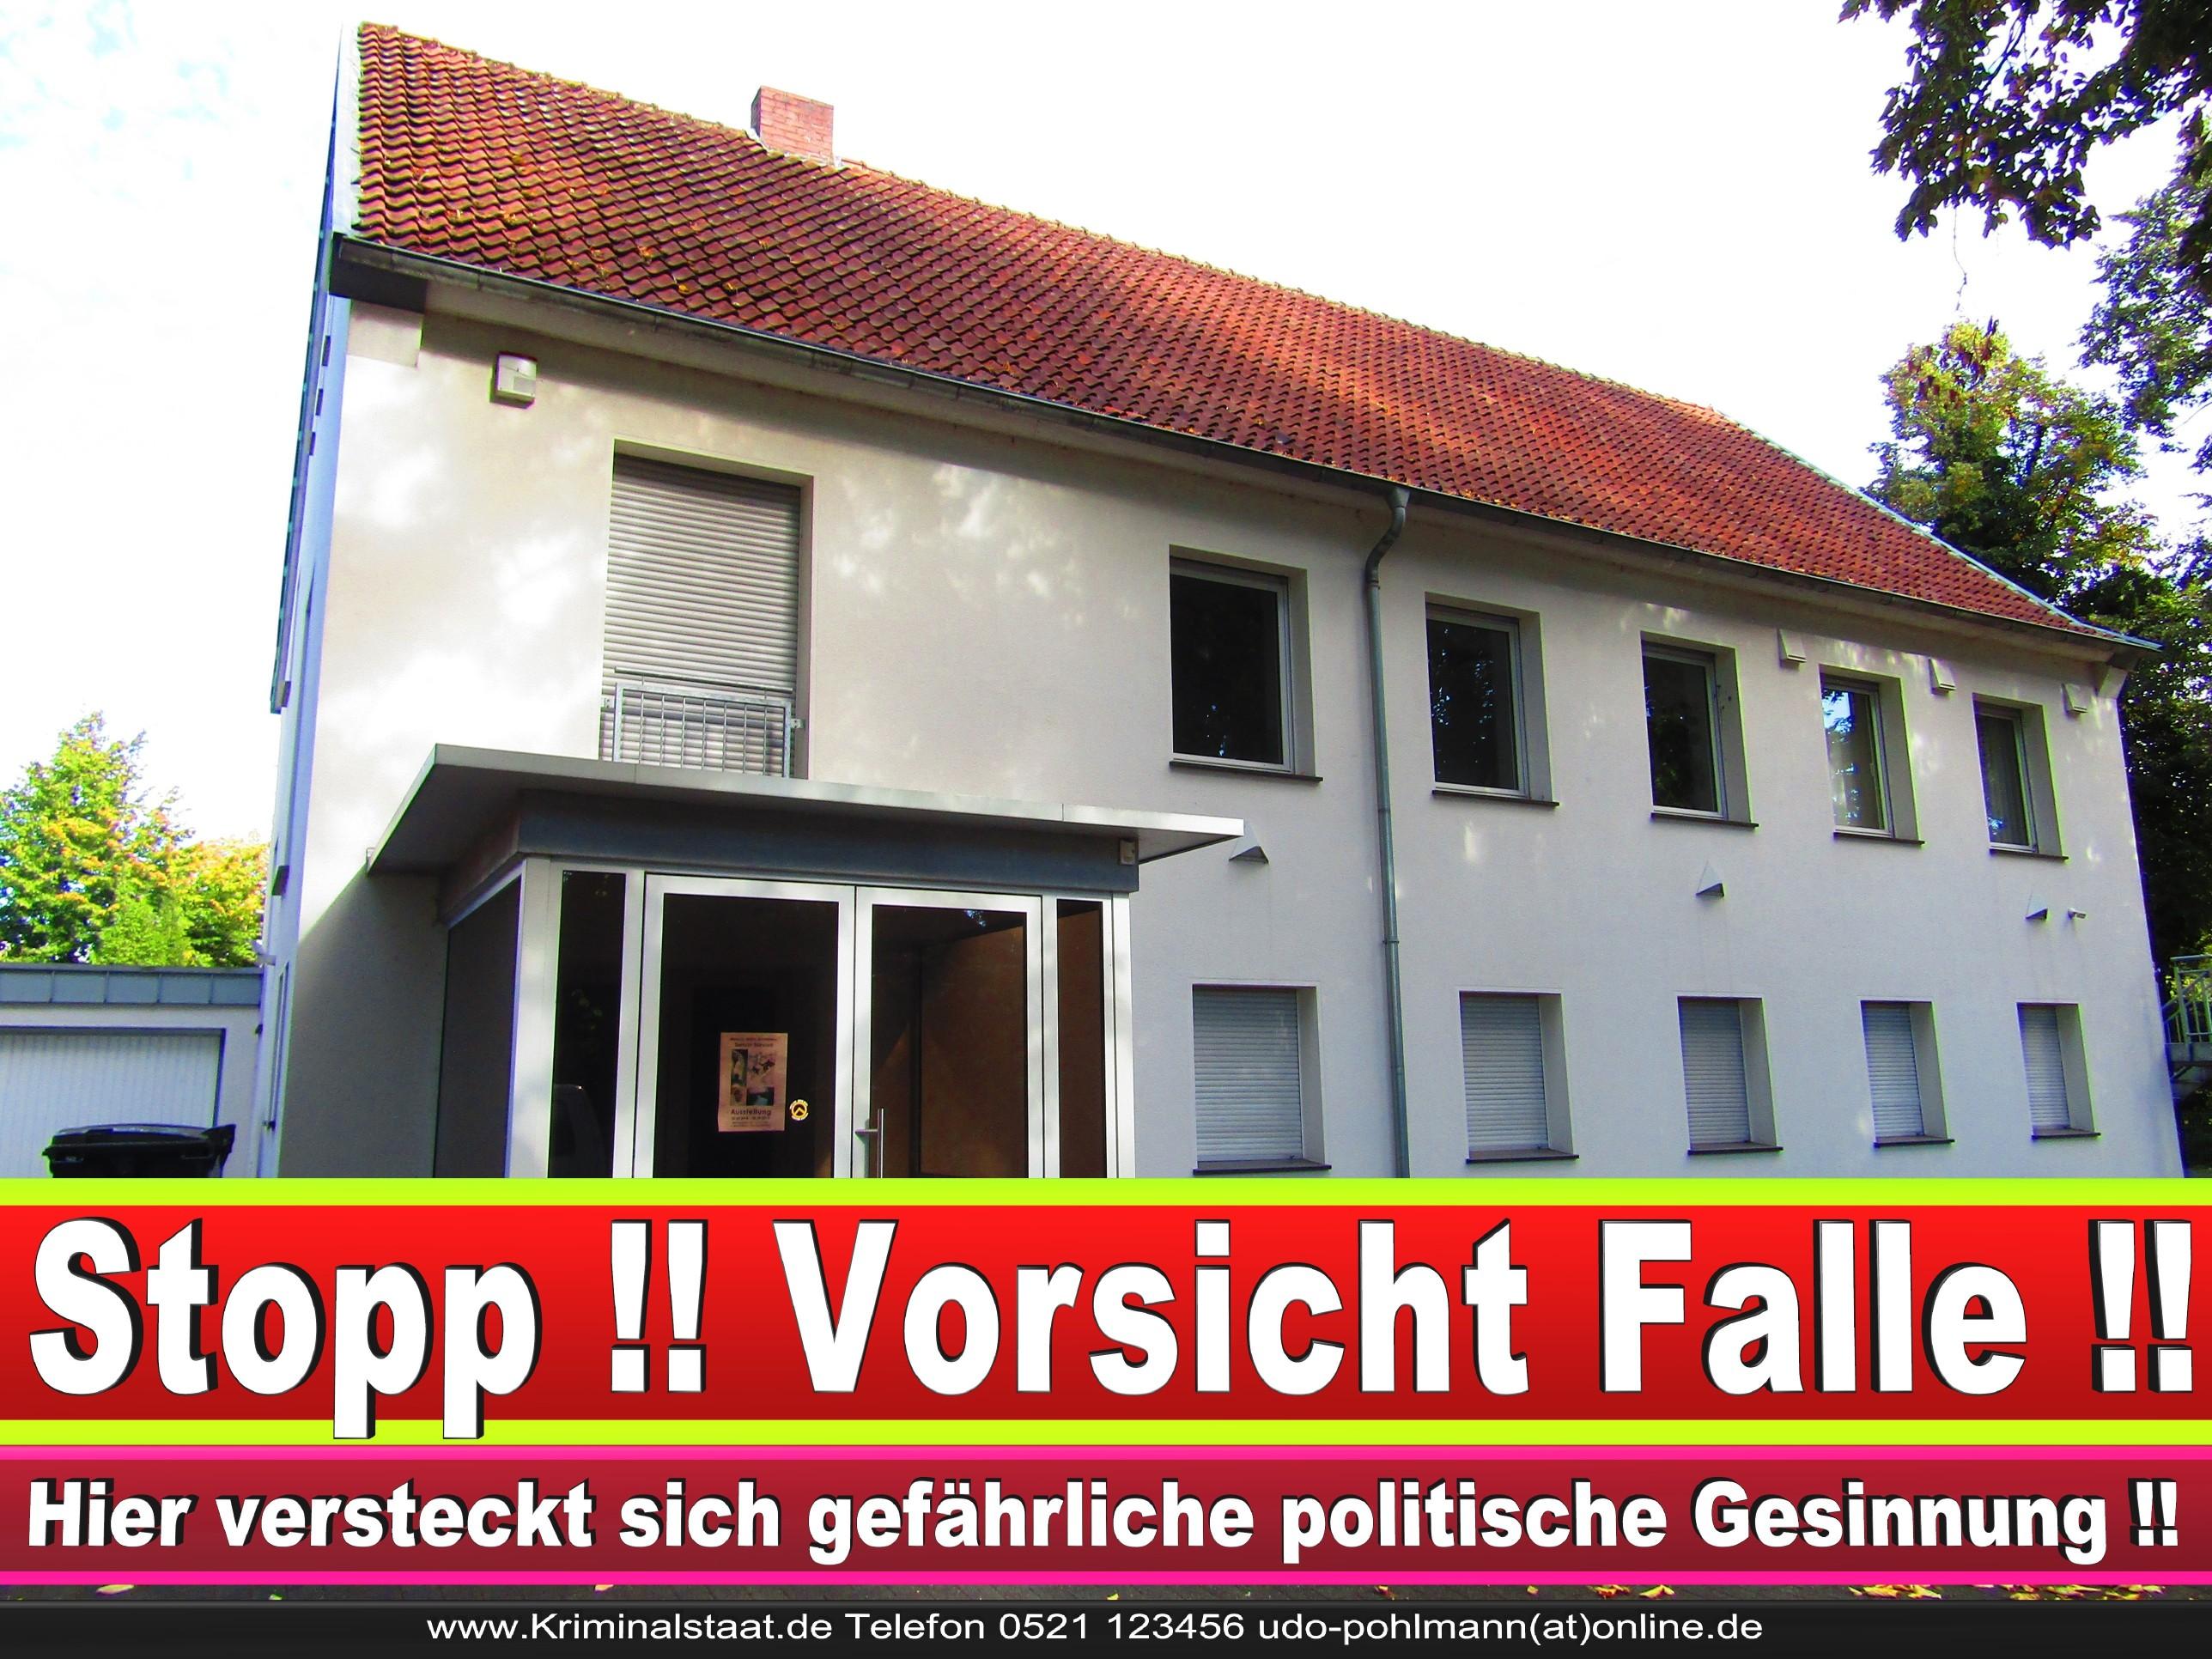 CDU GÜTERSLOH 2 LANDTAGSWAHL BUNDESTAGSWAHL BÜRGERMEISTERWAHL